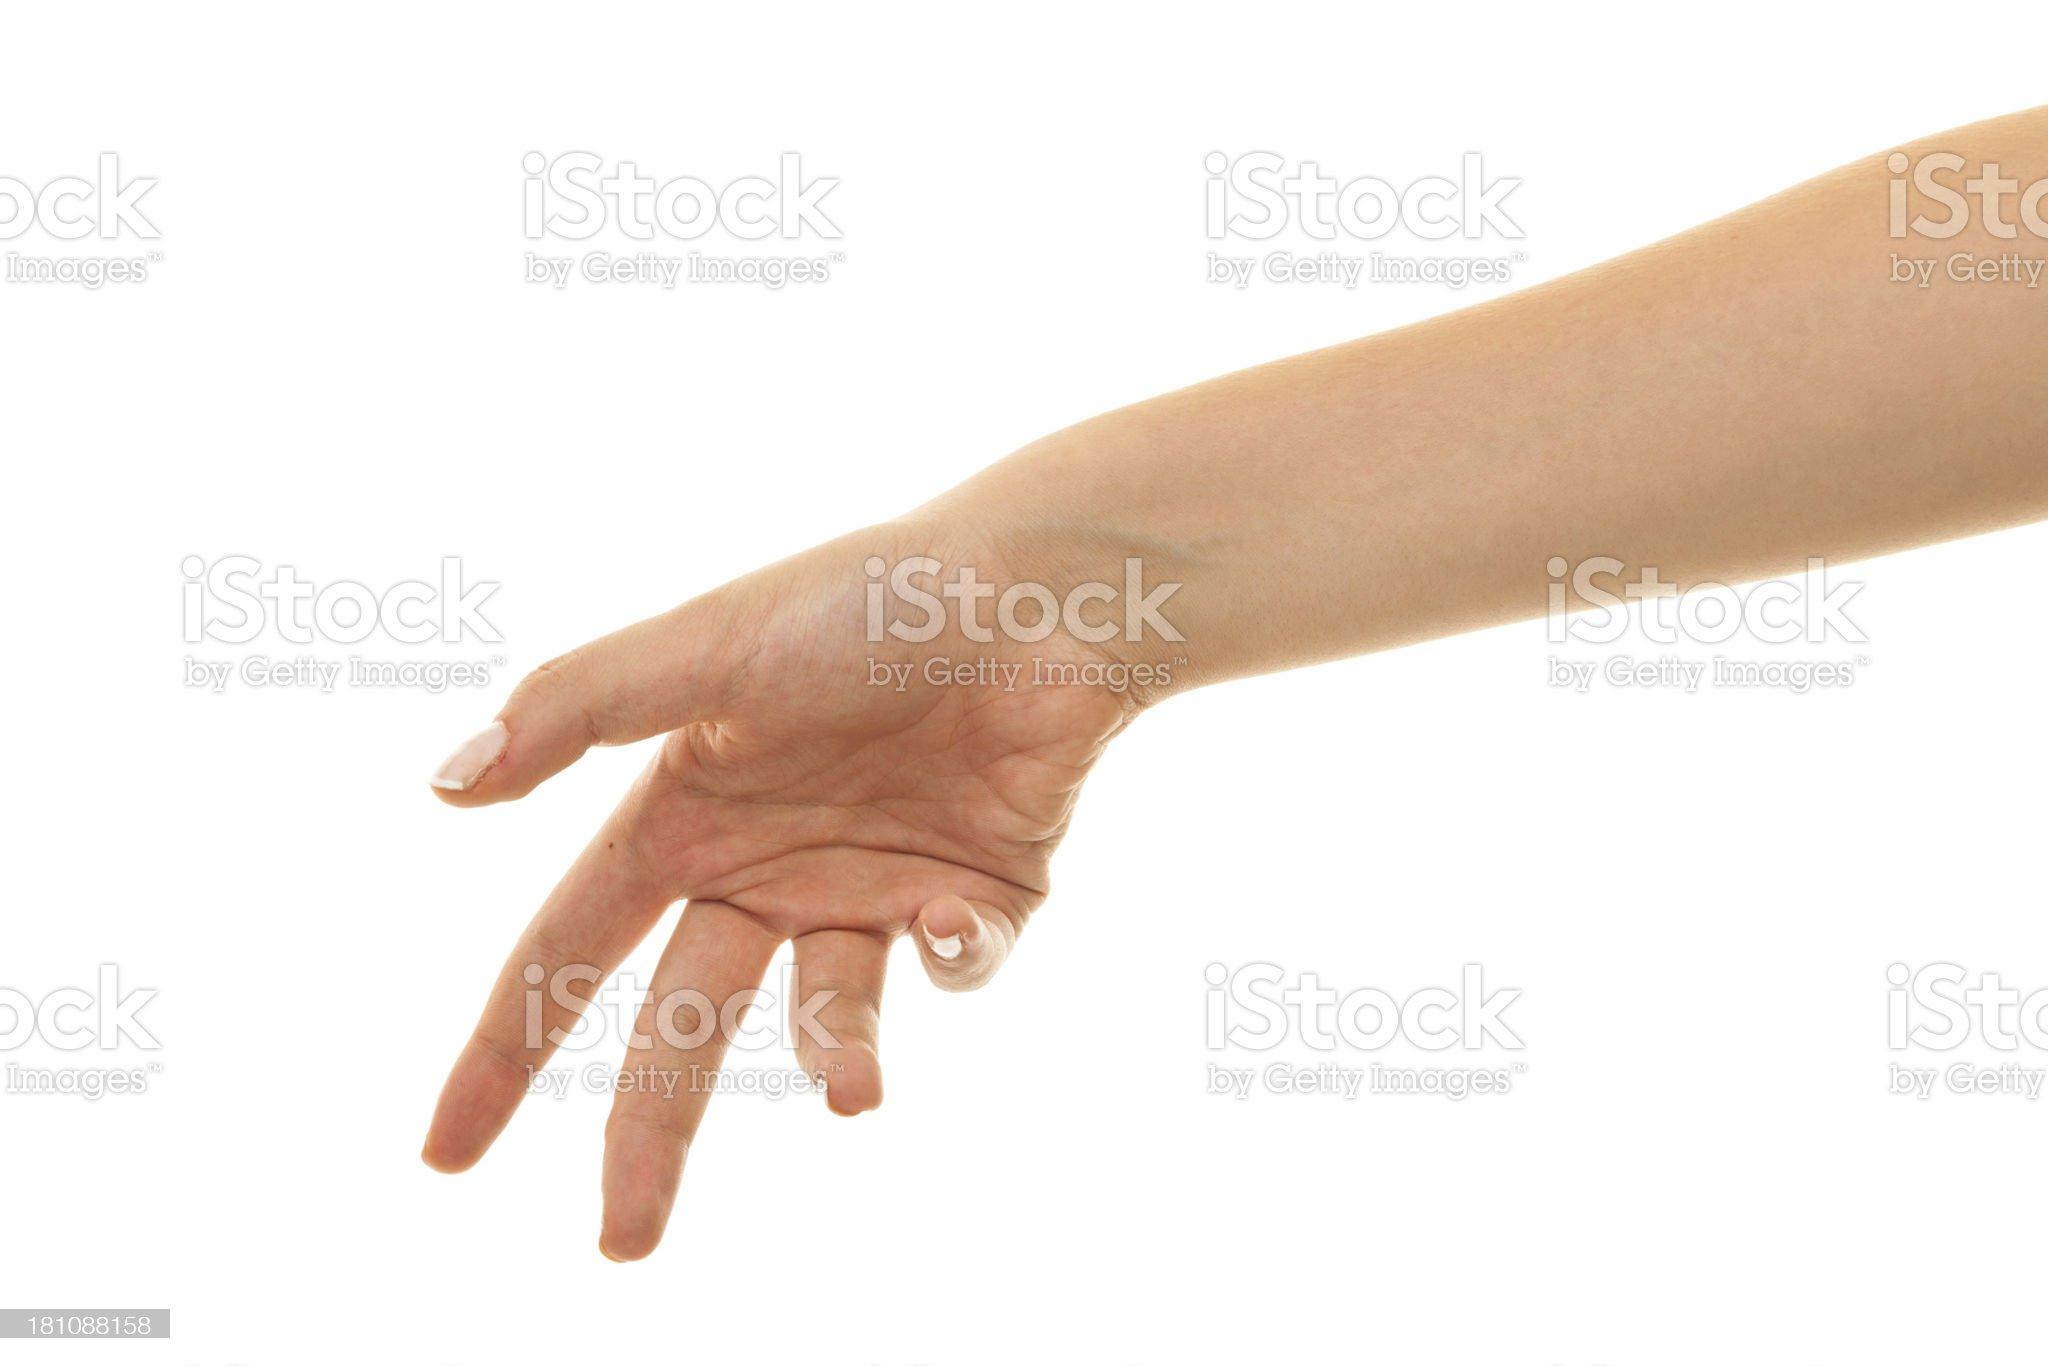 Hand throwing something royalty-free stock photo